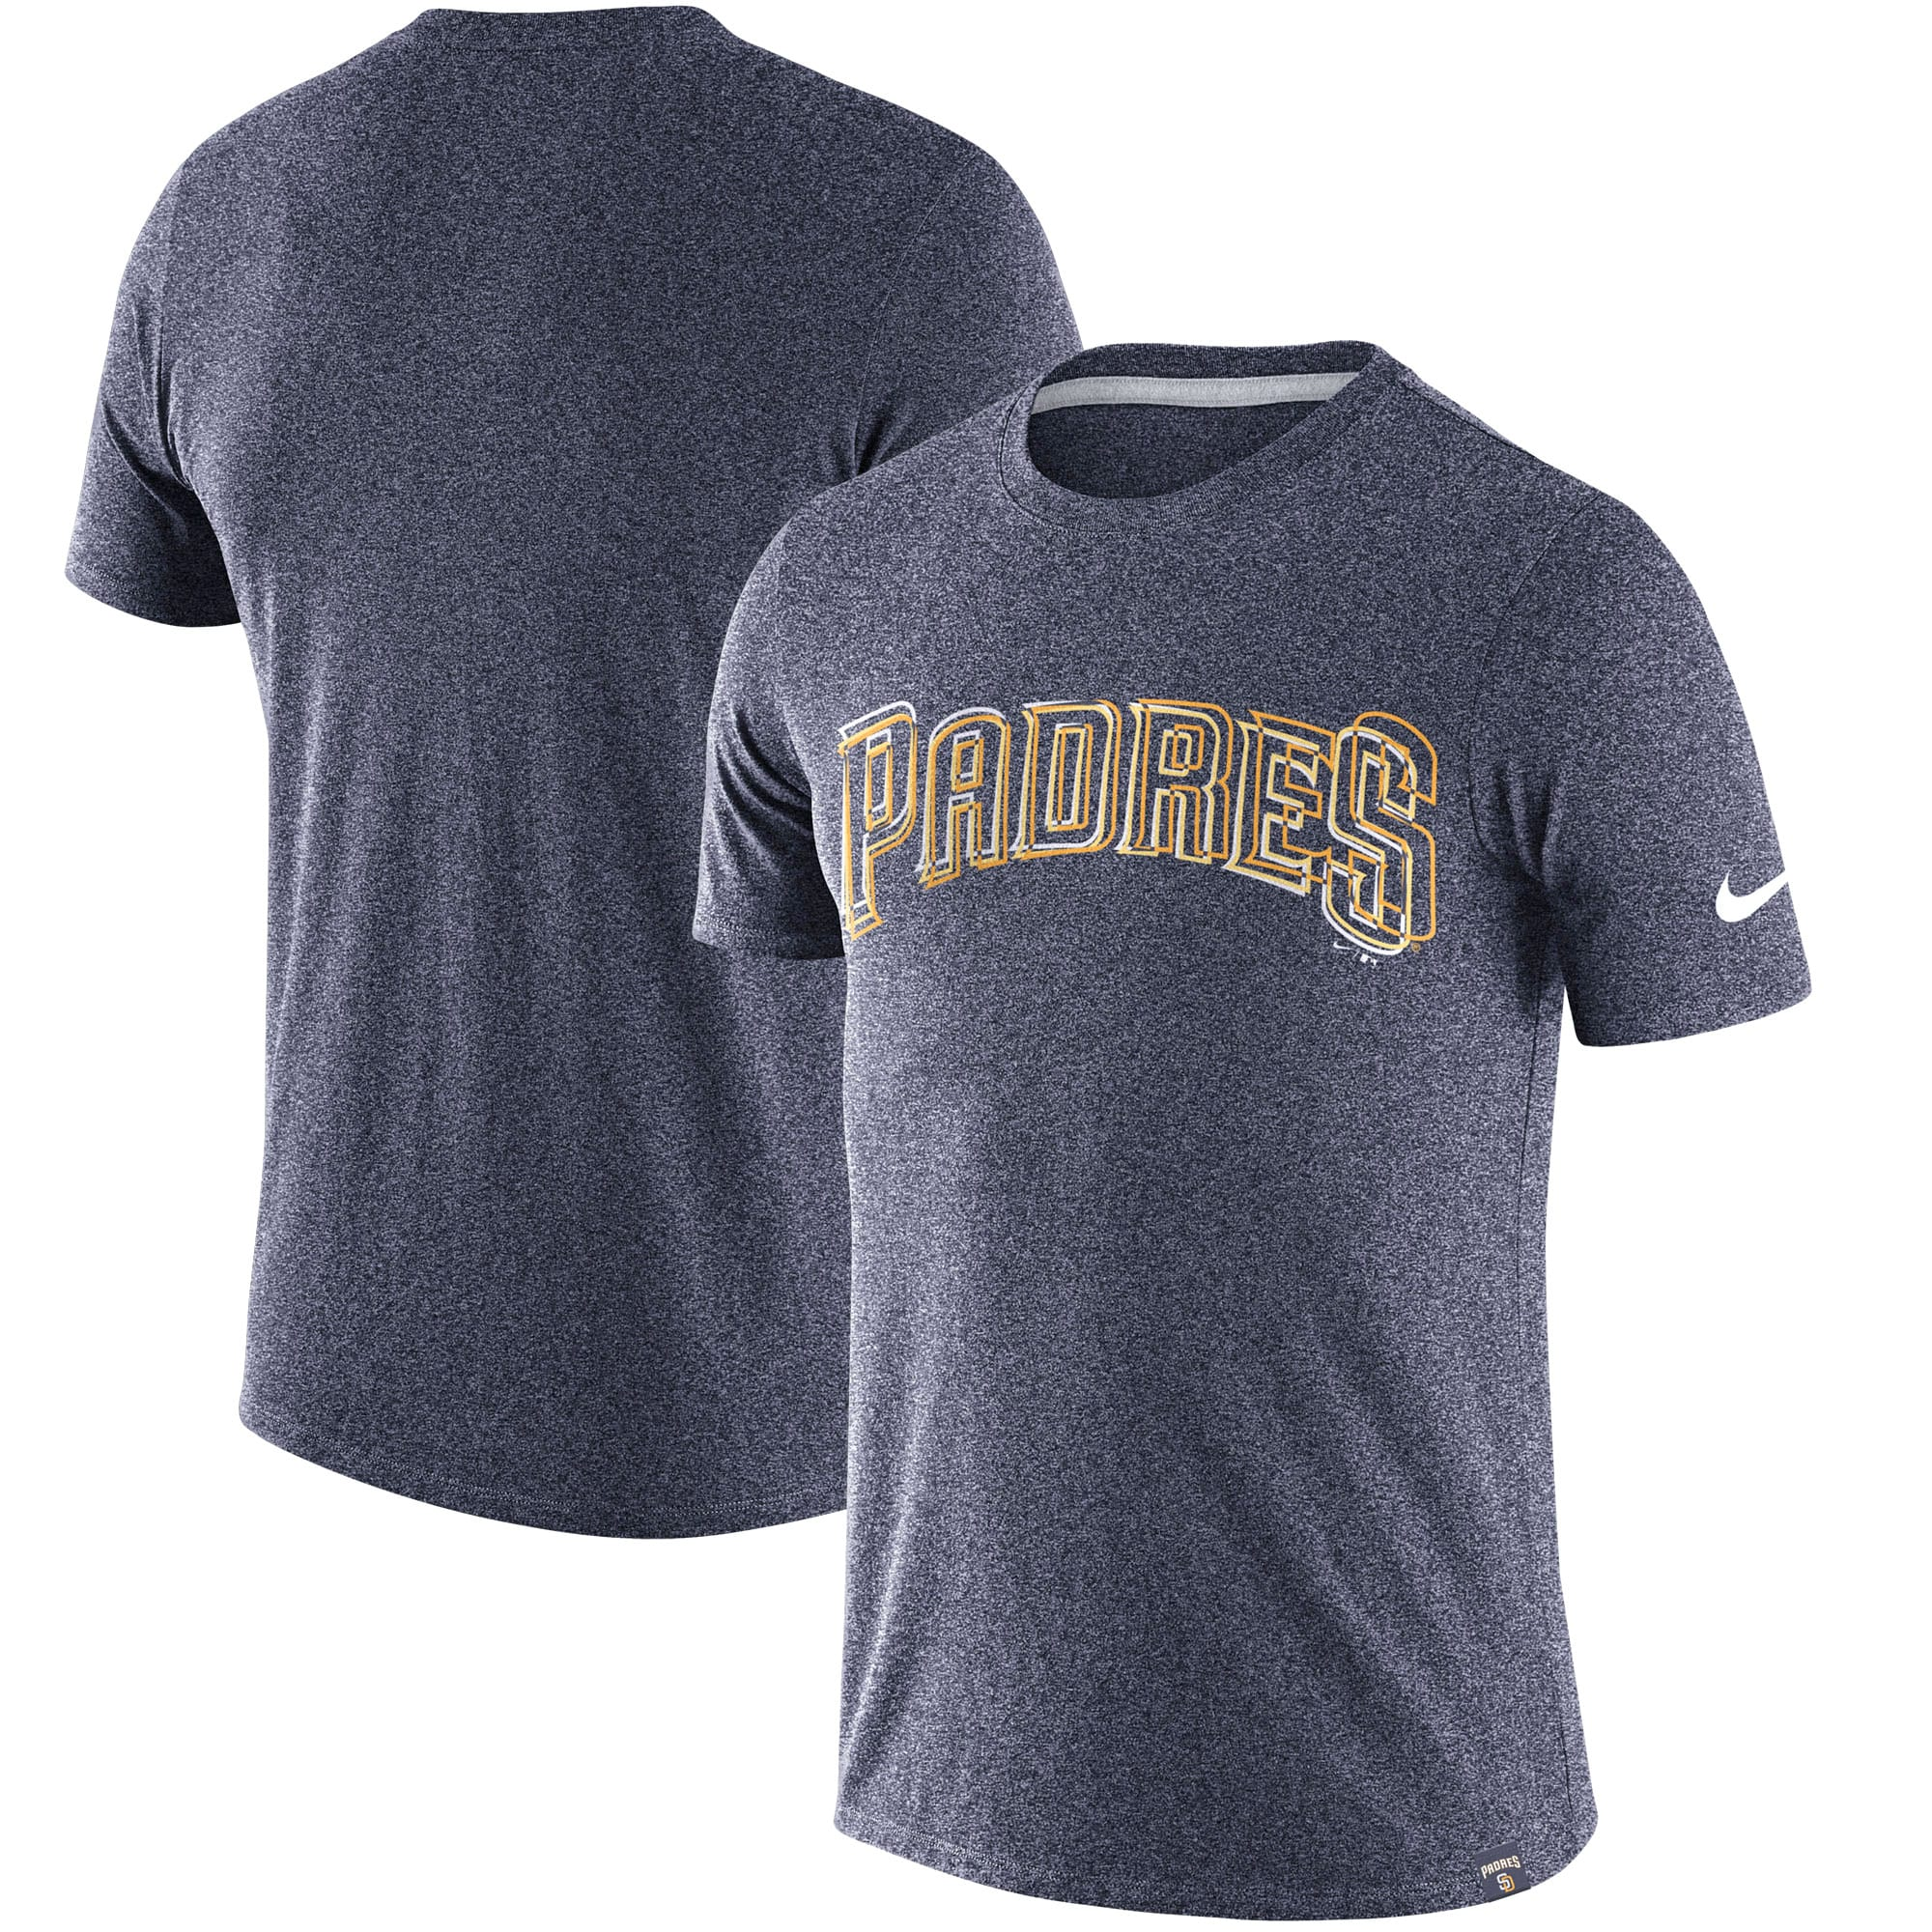 San Diego Padres Nike Marled Wordmark T-Shirt - Heathered Navy